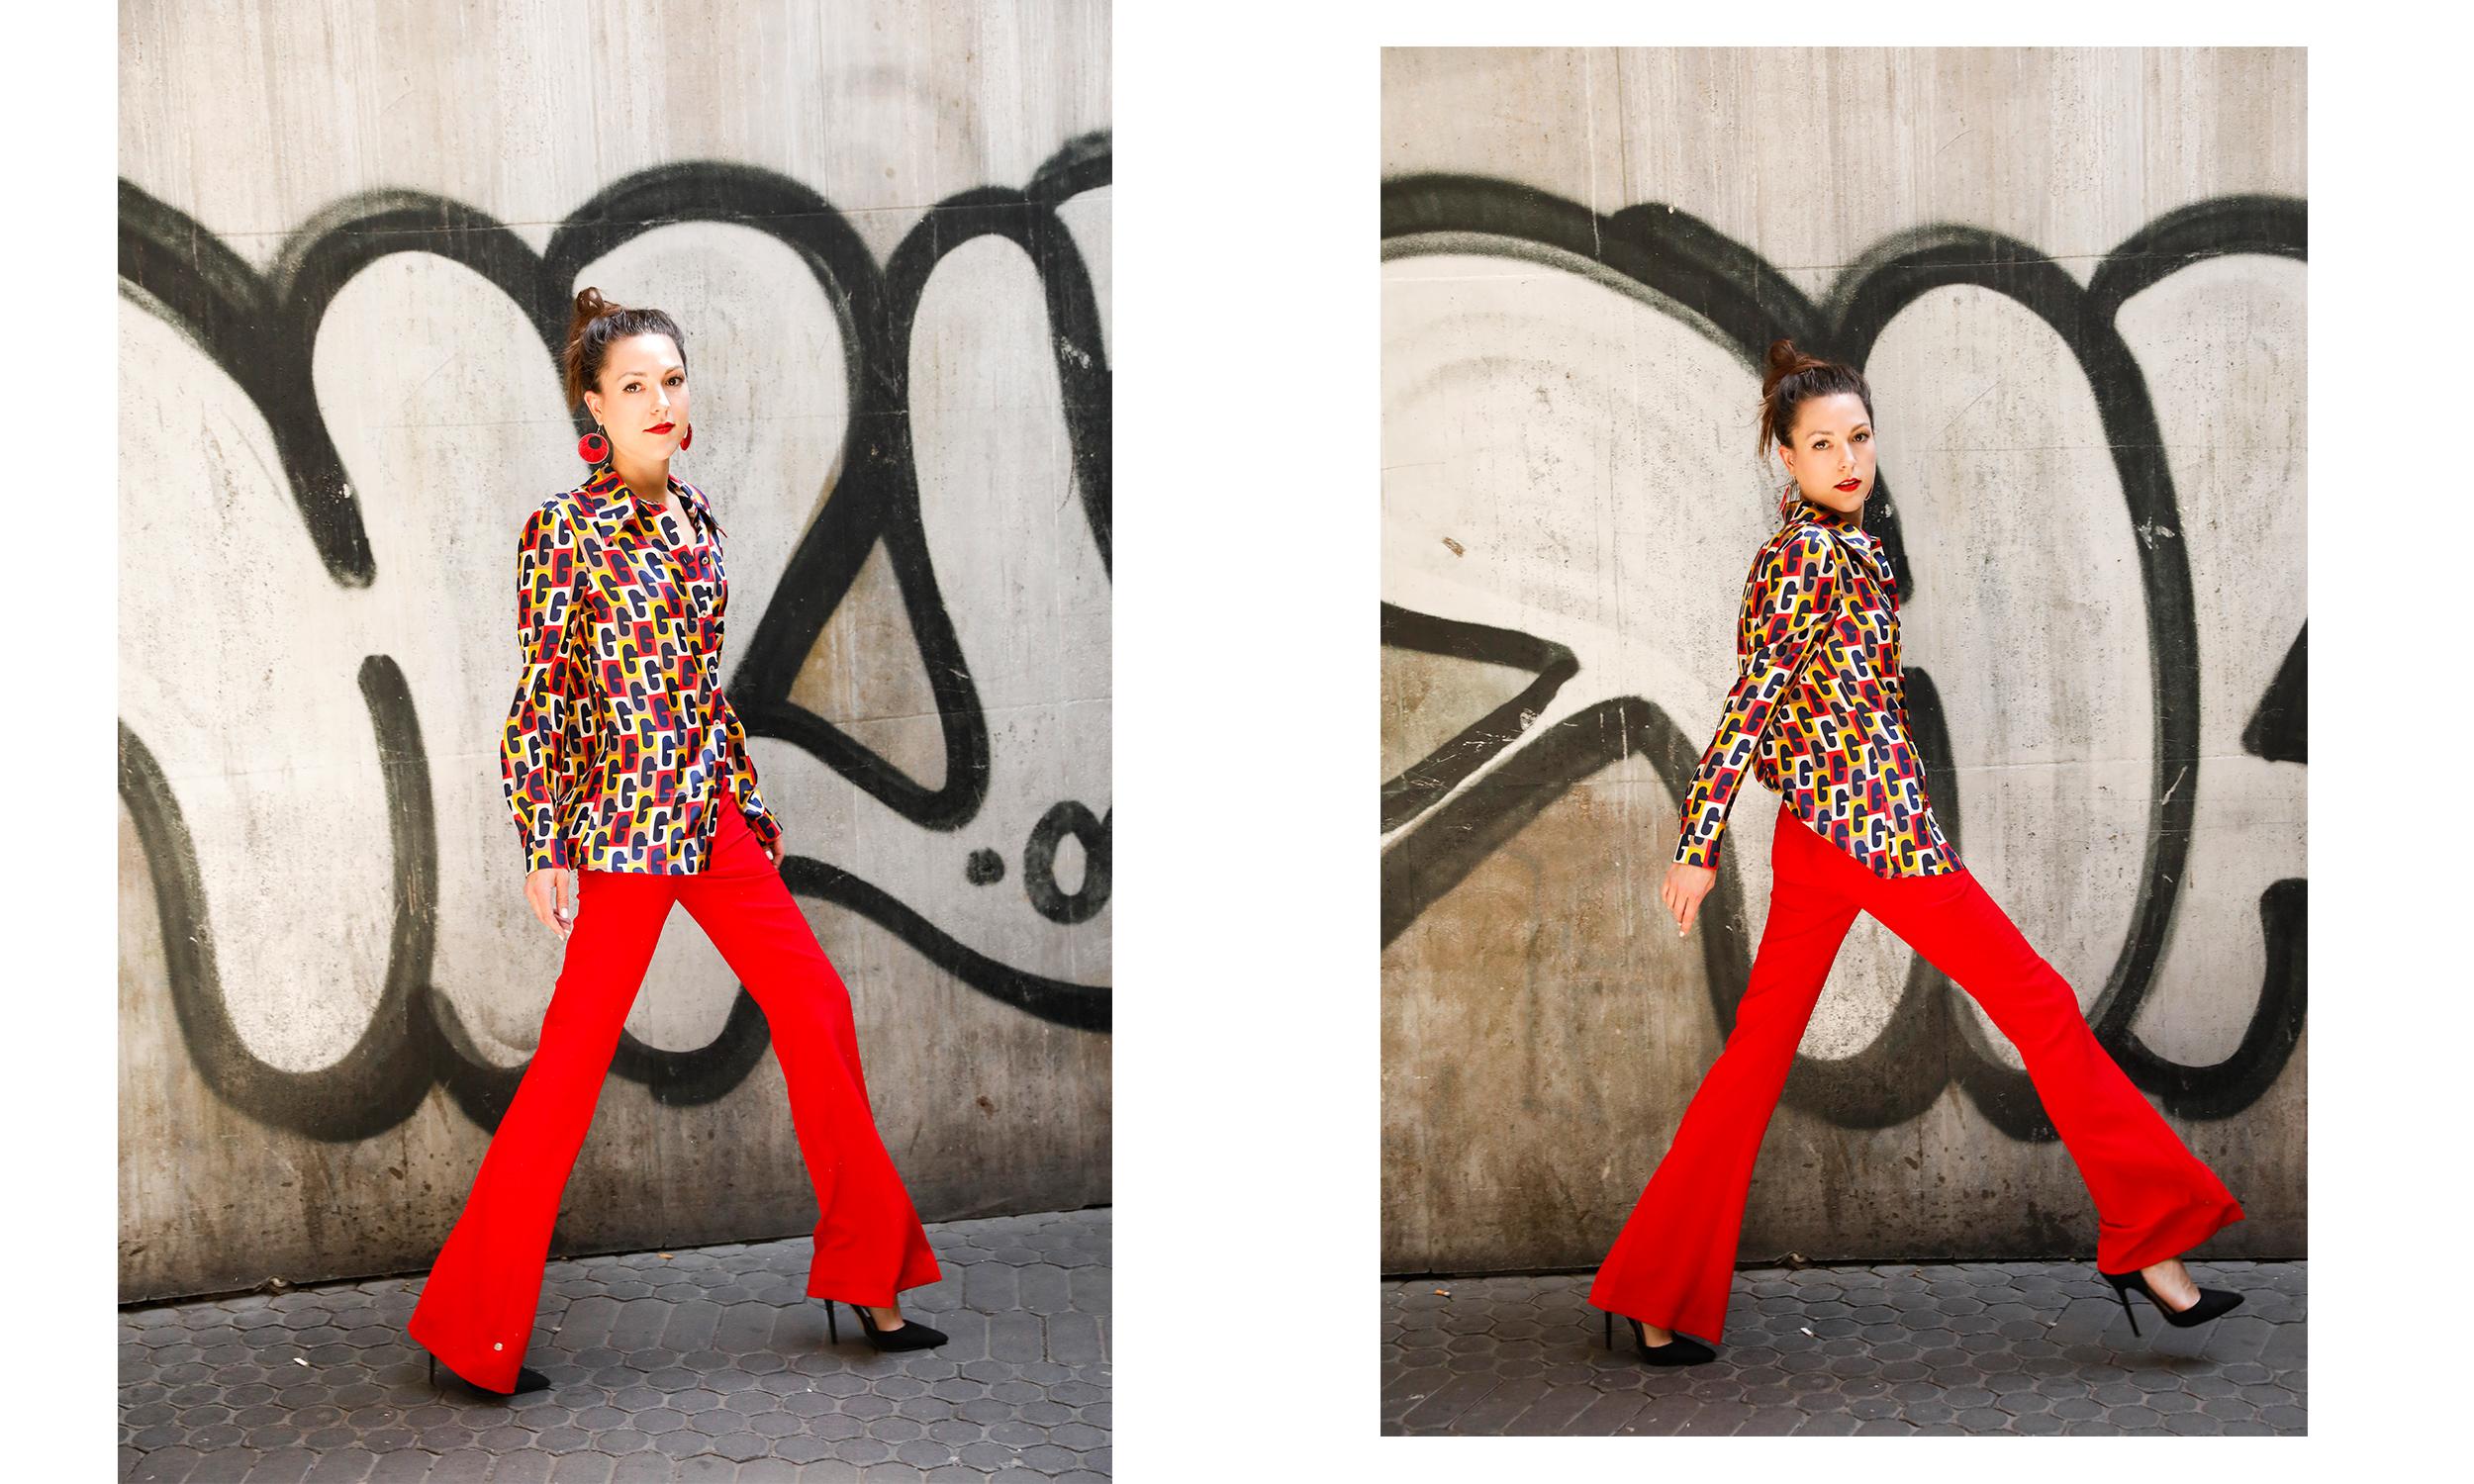 emerson-renaldi-work-wear-gucci-celine-box-bag-2.jpg